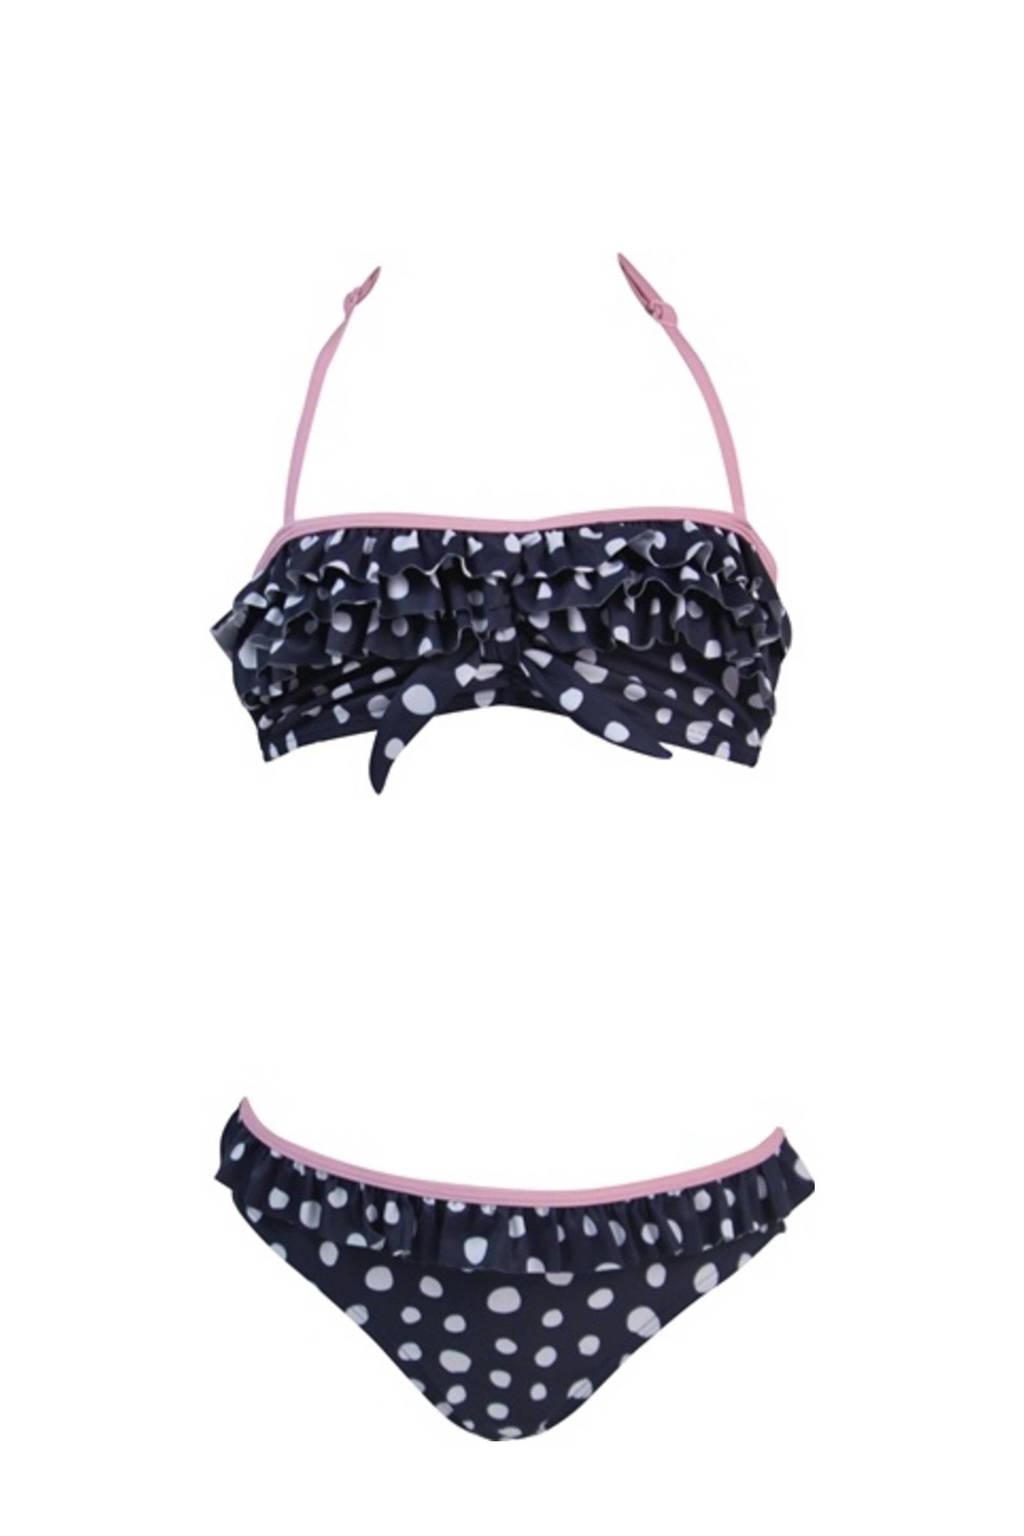 Lentiggini bandeau bikini Dots met all over print blauw/wit/roze, Blauw/wit/roze